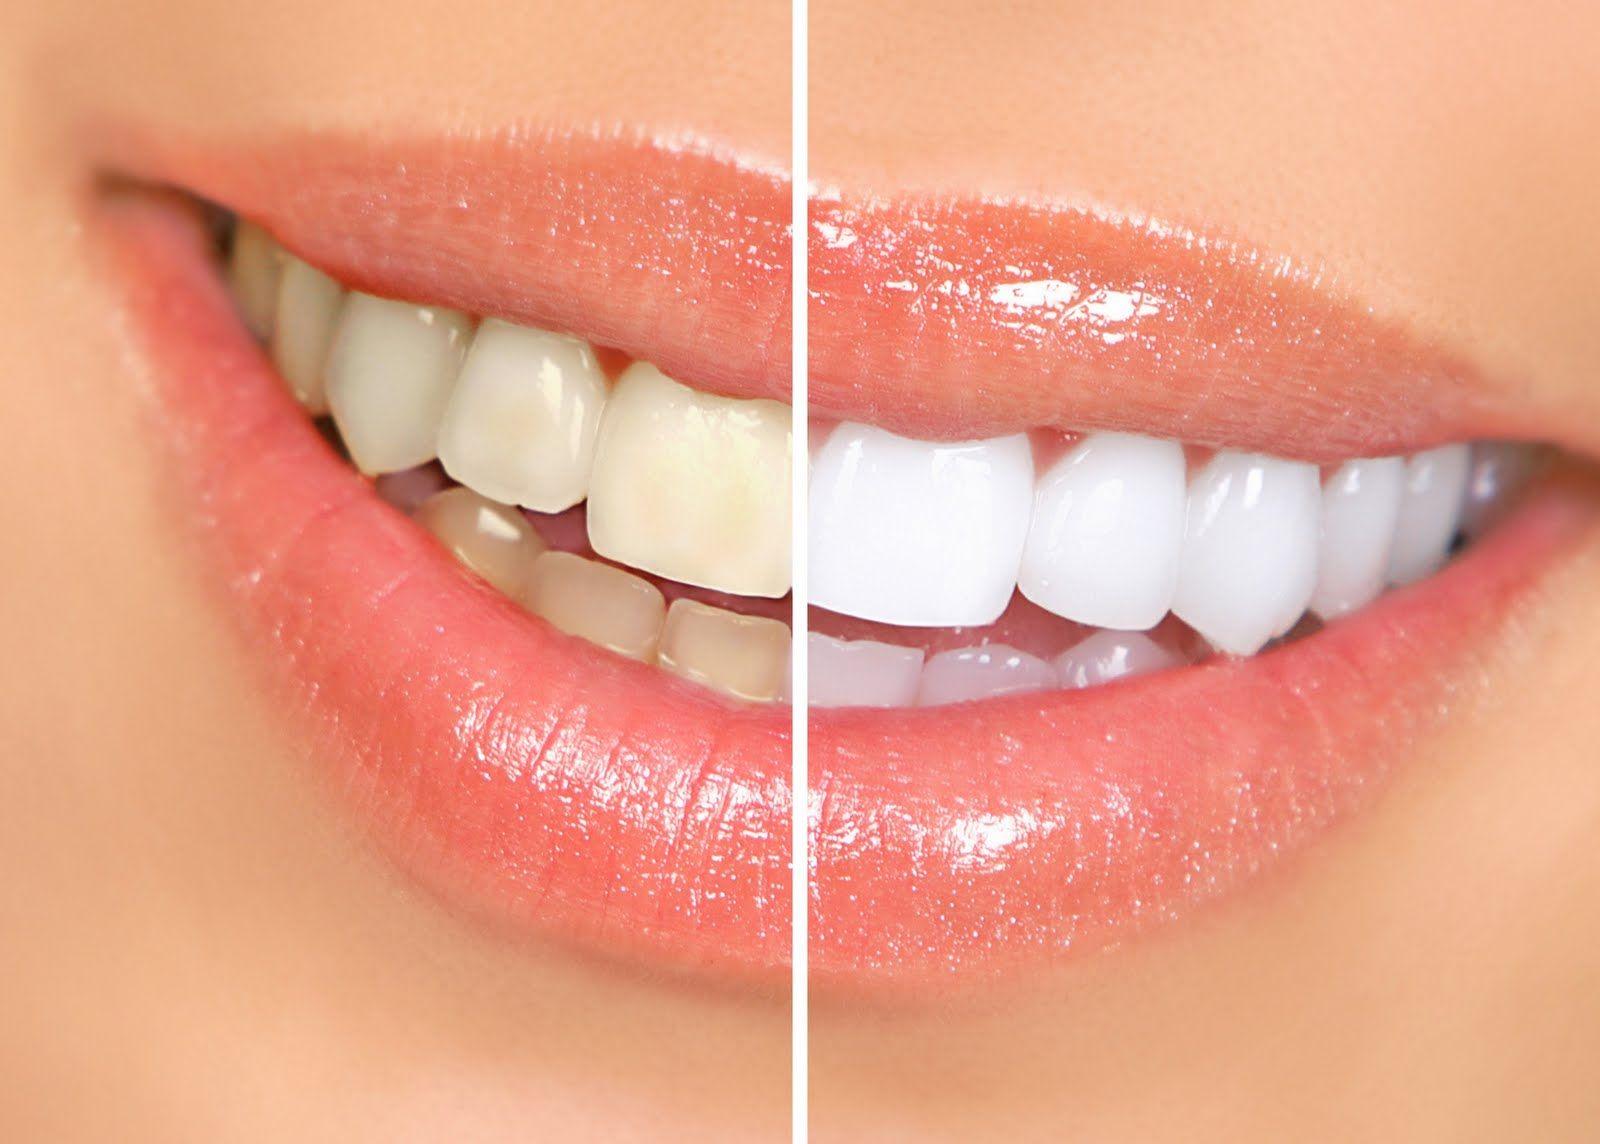 Clareamento Dental Moldeira Antes E Depois Clareamento Dental